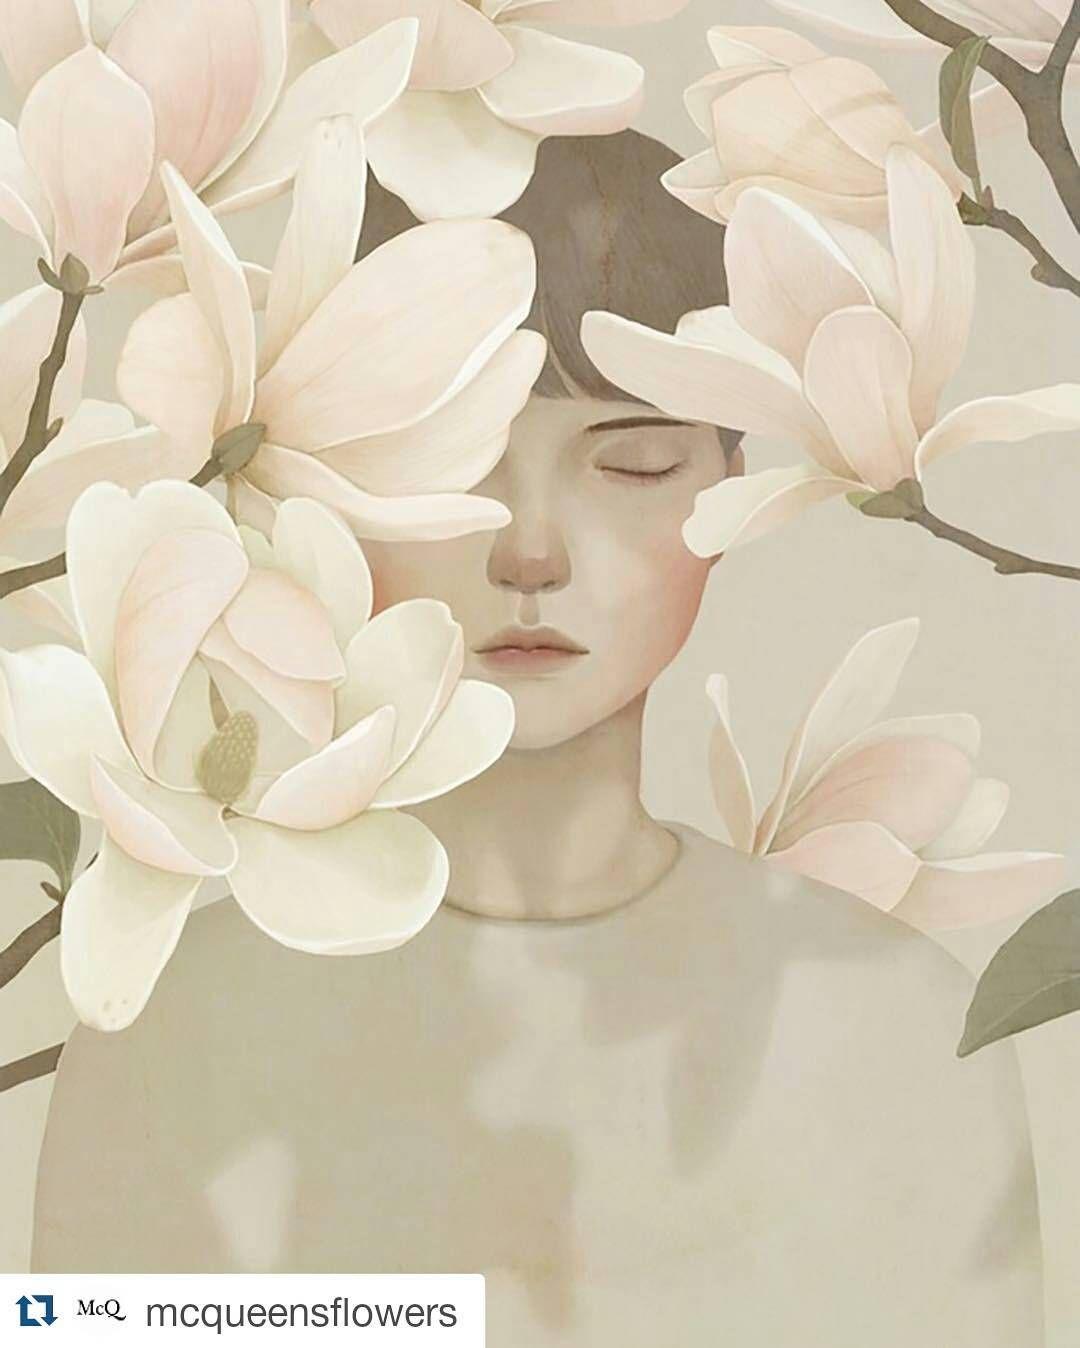 #Repost @mcqueensflowers with @repostapp ・・・ We've featured the wonderful work of artist and illustrator @jiwoon_pak in #McQueensTheBlog (direct link in bio) #jiwoonpak #McQueens #flowers  런던 플라워스쿨 맥퀸즈의 블로그에 제 작업이 소개되었어요:)